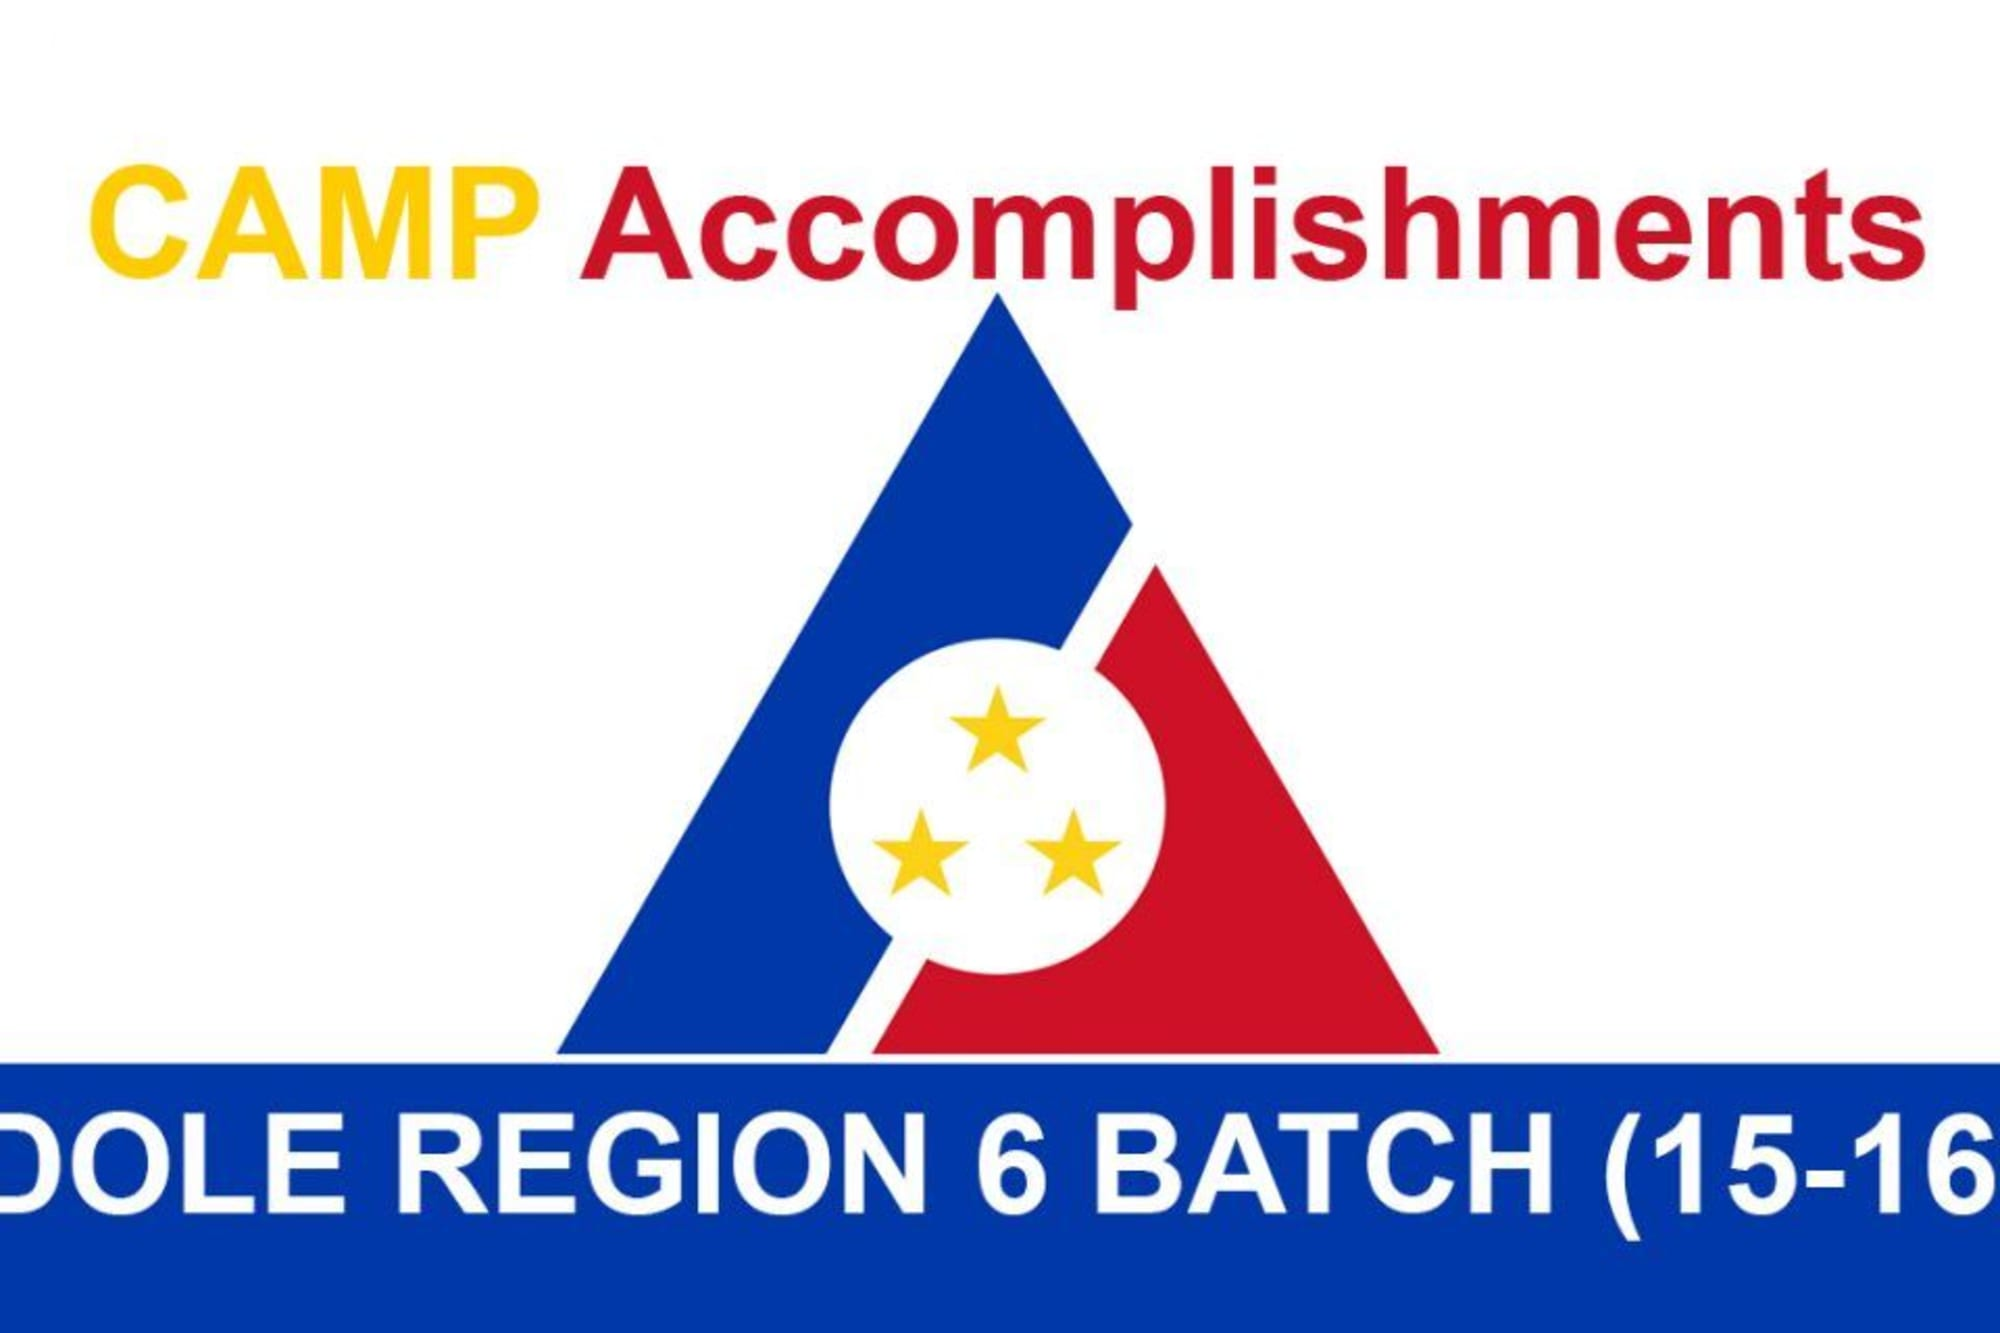 DOLE REGION 6 CAMP Accomplishments Batch (15-16); Alphabetical Order of list of companies